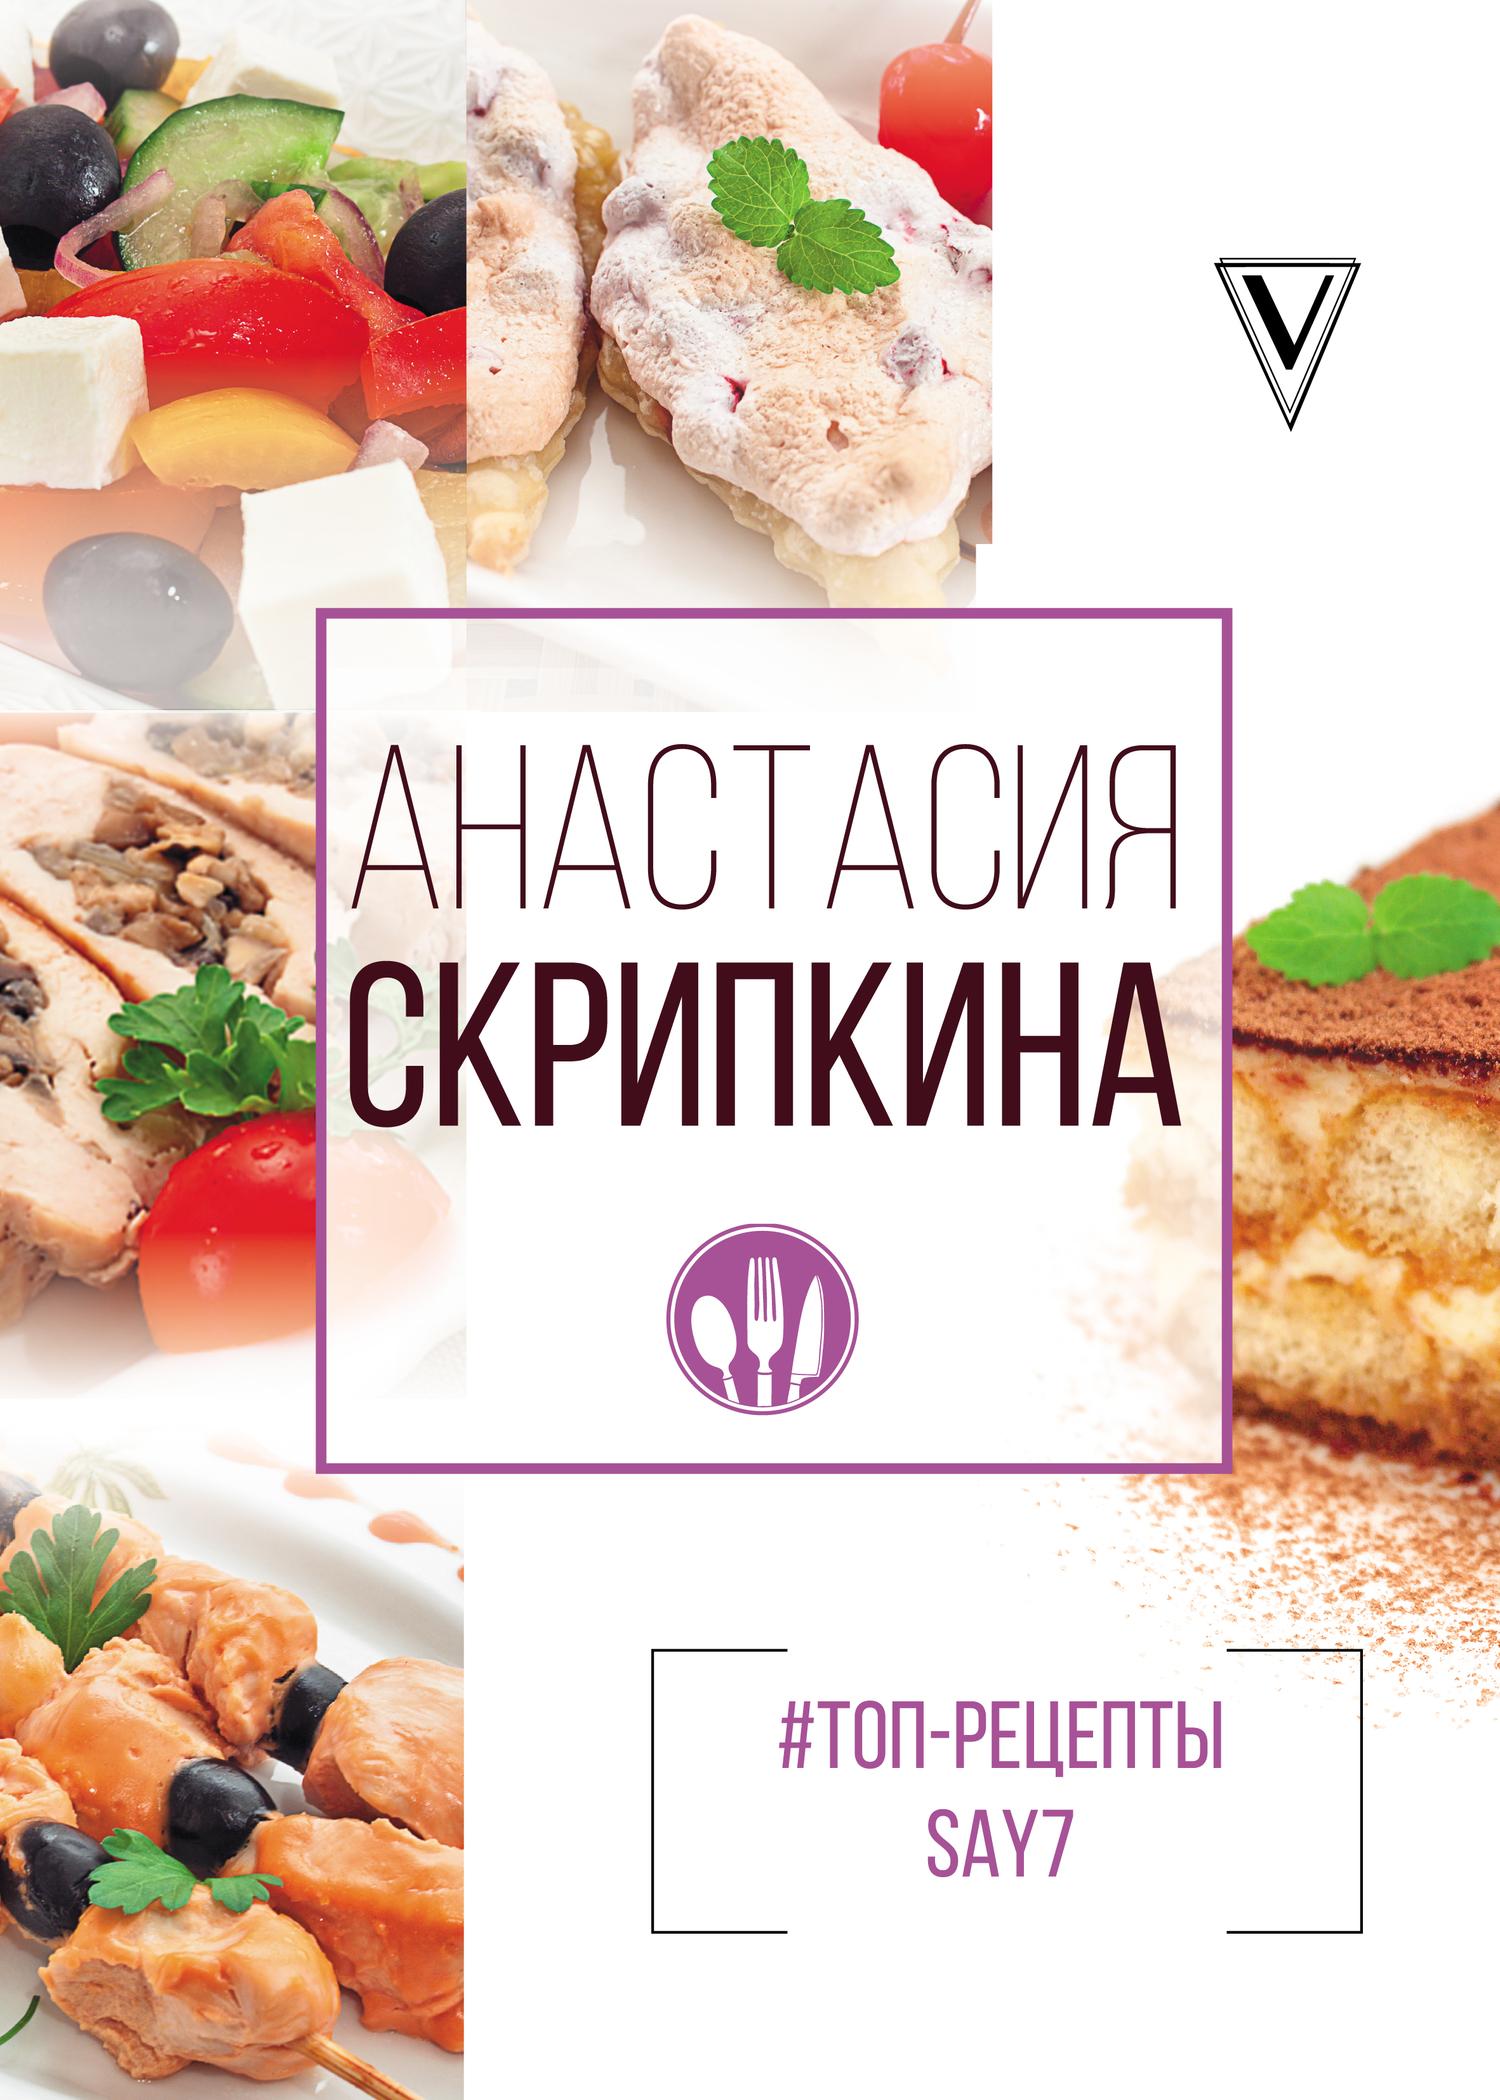 #Топ-рецепты